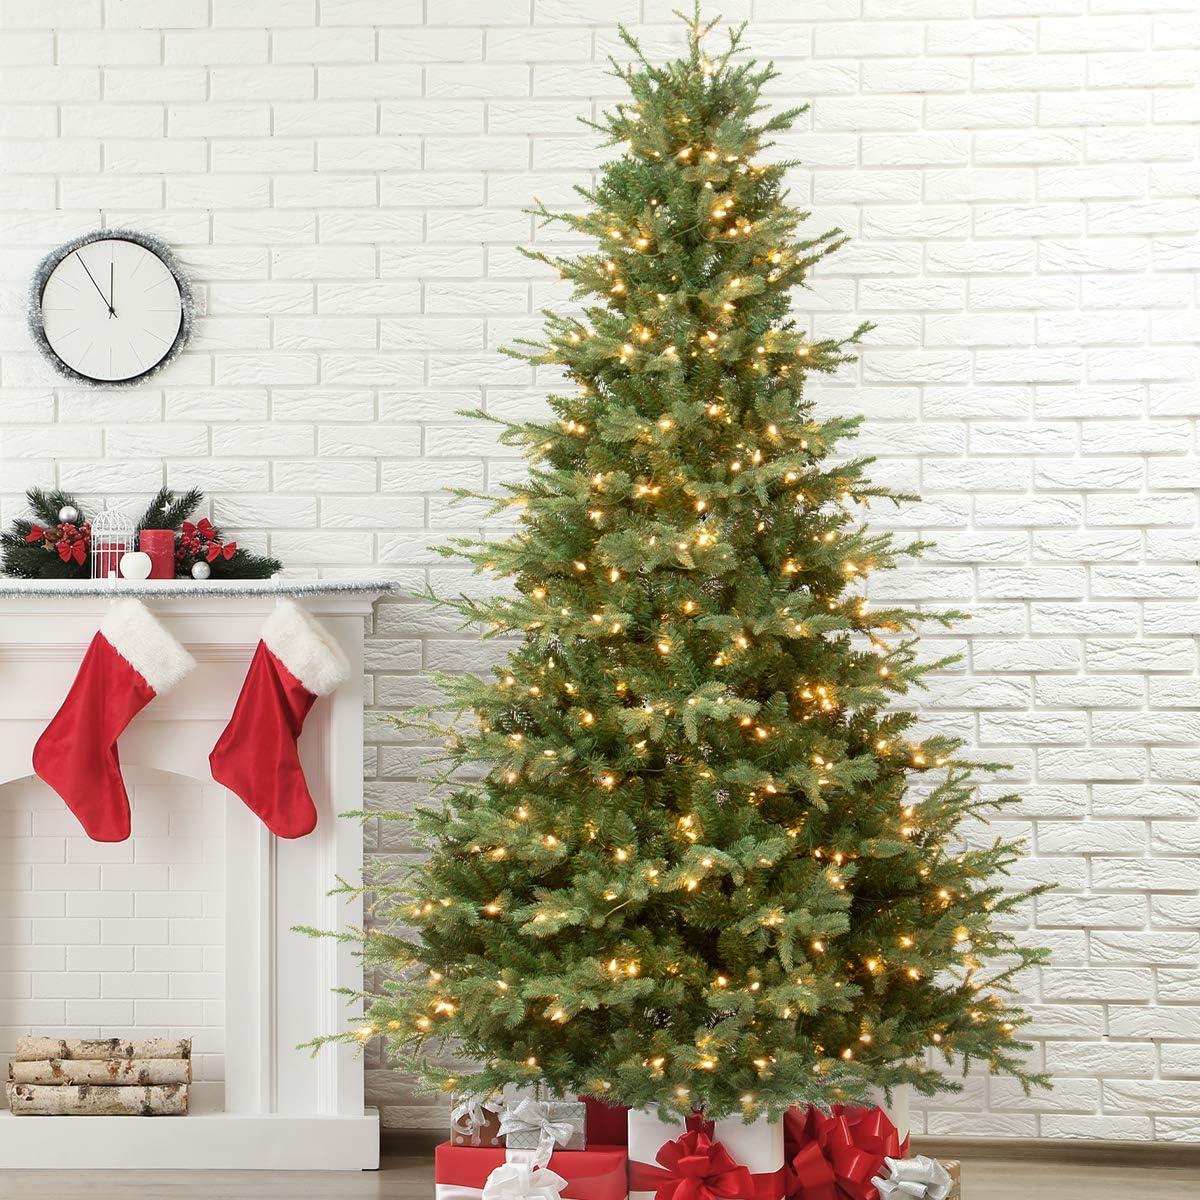 Albuquerque Mall OasisCraft 6.5FT Pre-lit Fir Tree - Natural Christmas New sales